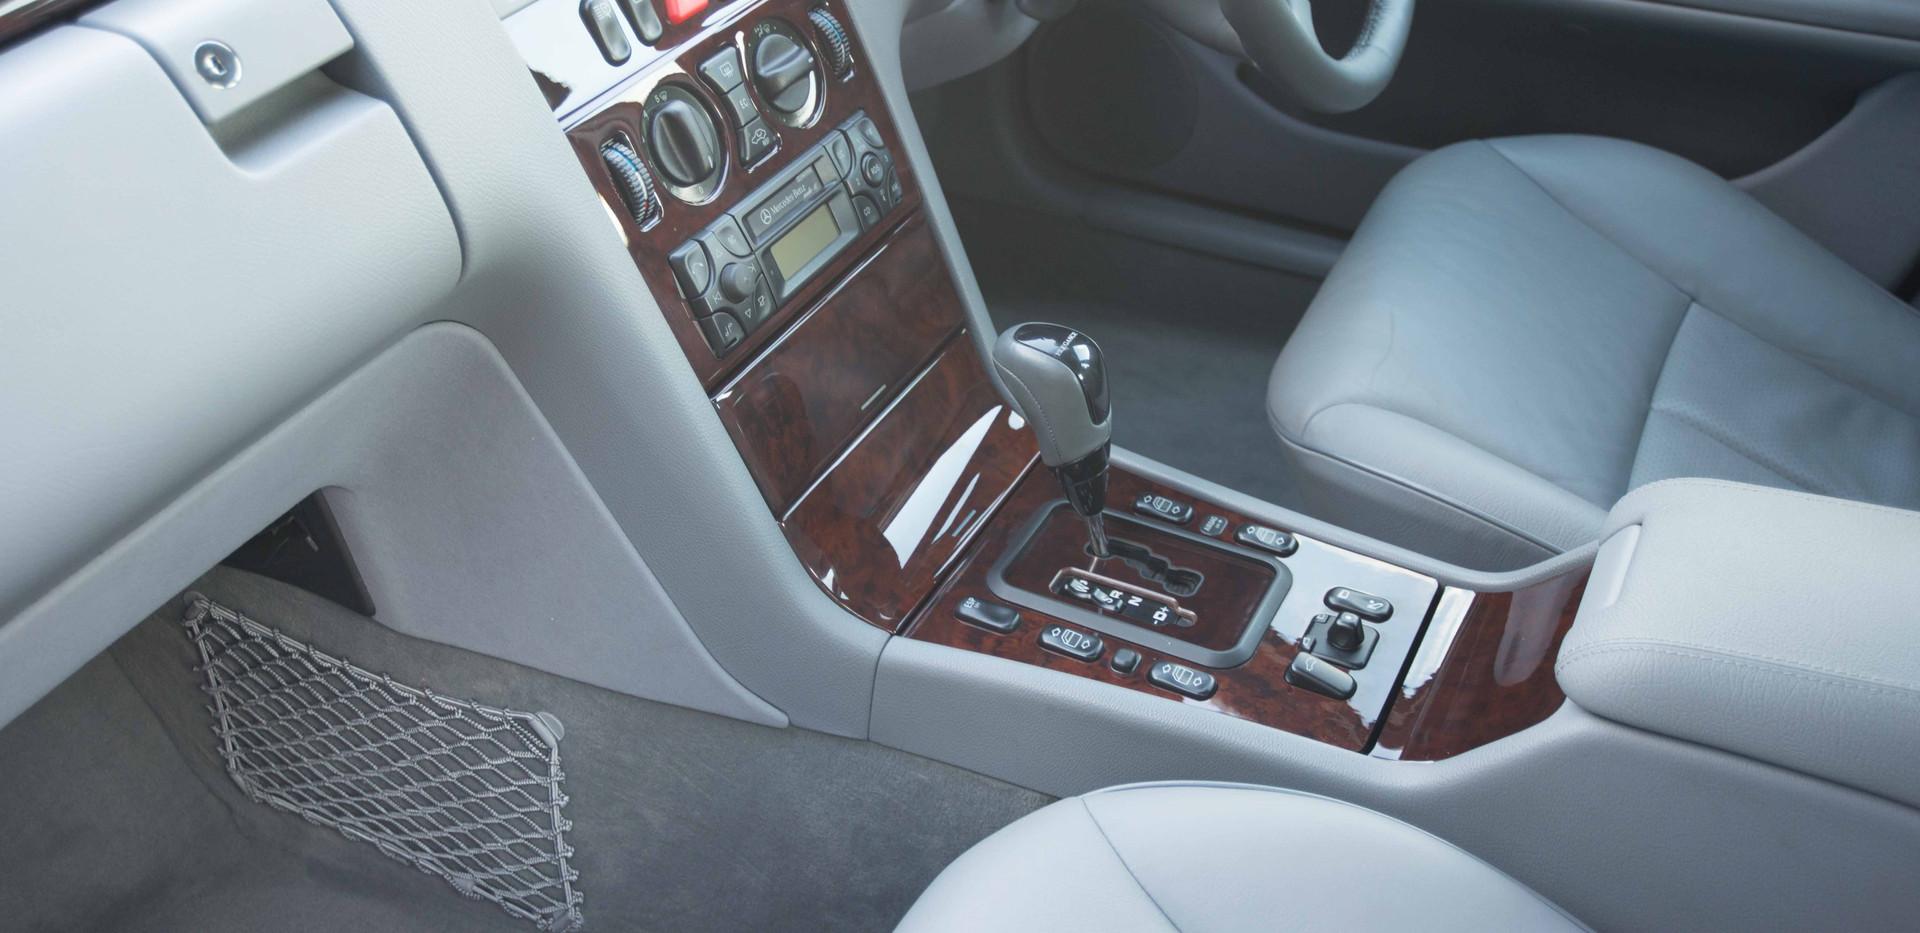 Mercedes E240 For Sale UK London  (68 of